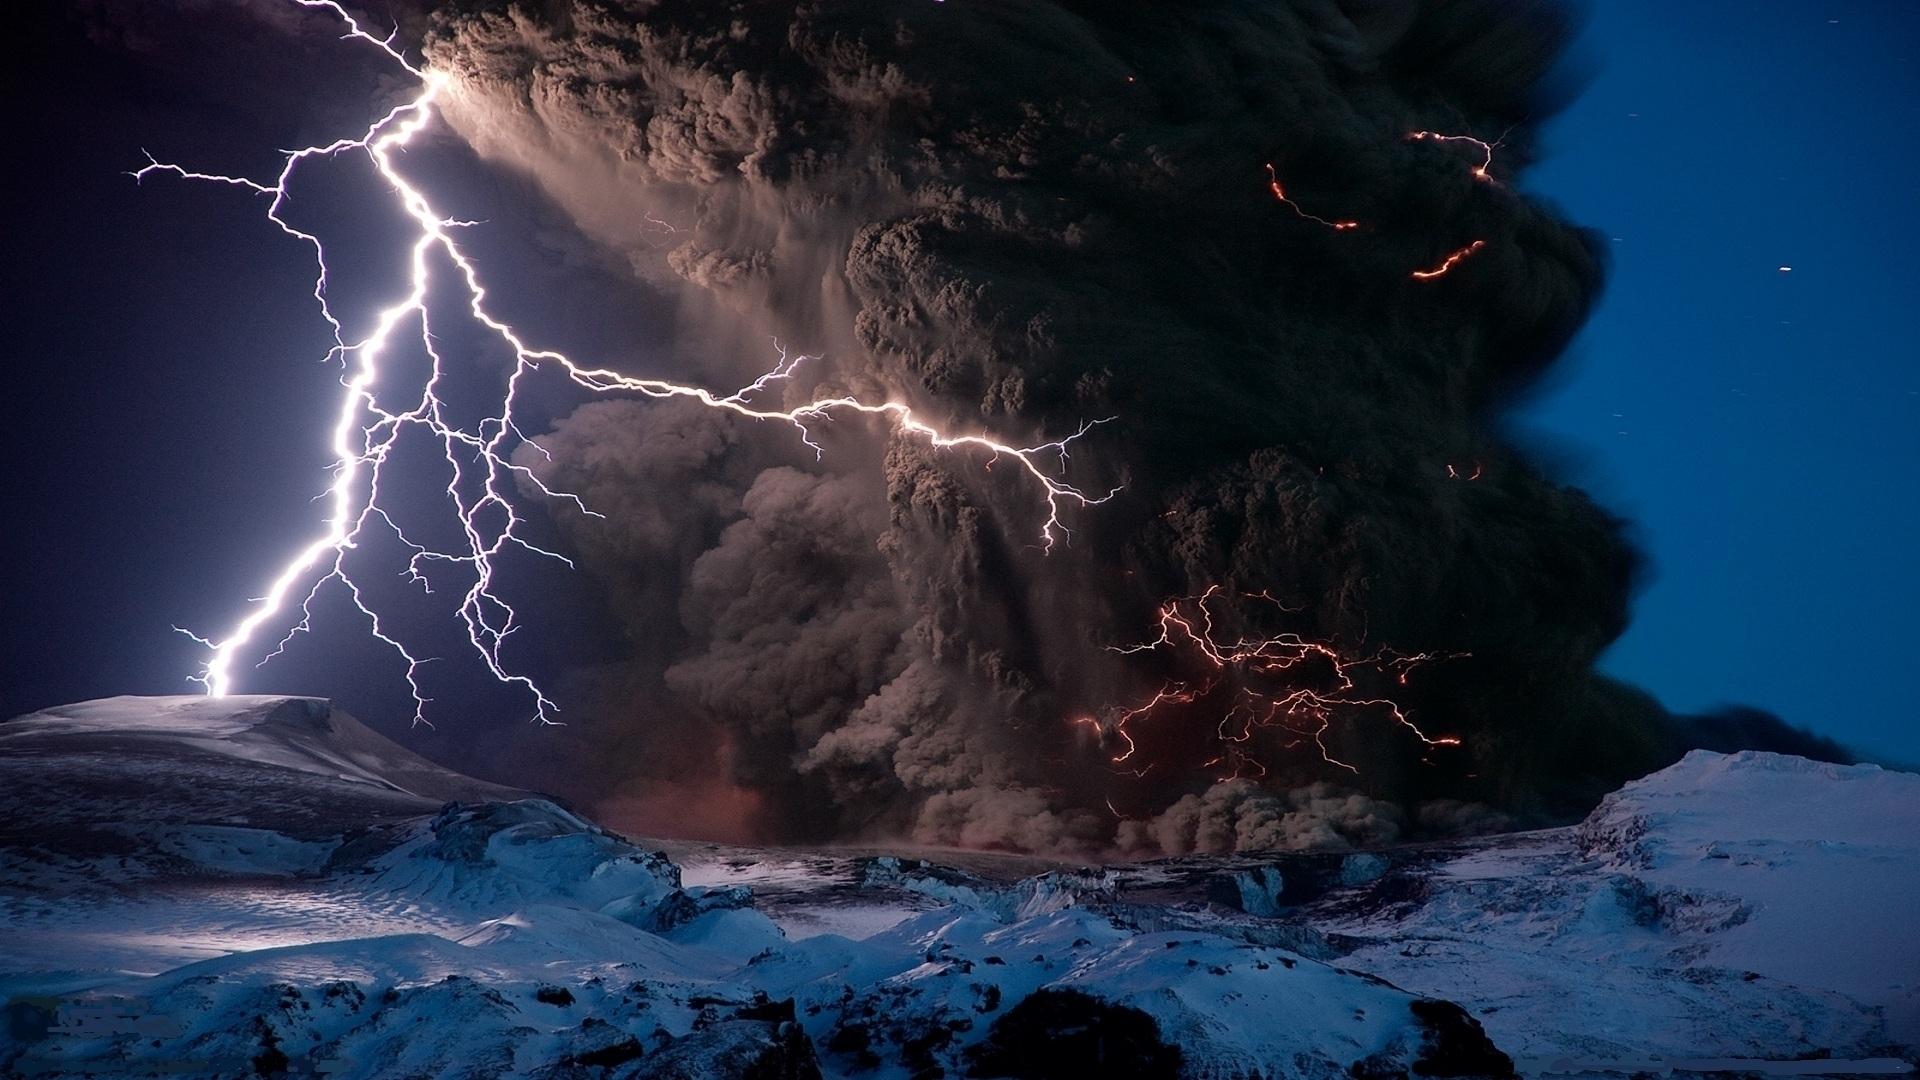 Thunder Lightning Wallpaper Background HD Desktop Wallpapers 1920x1080